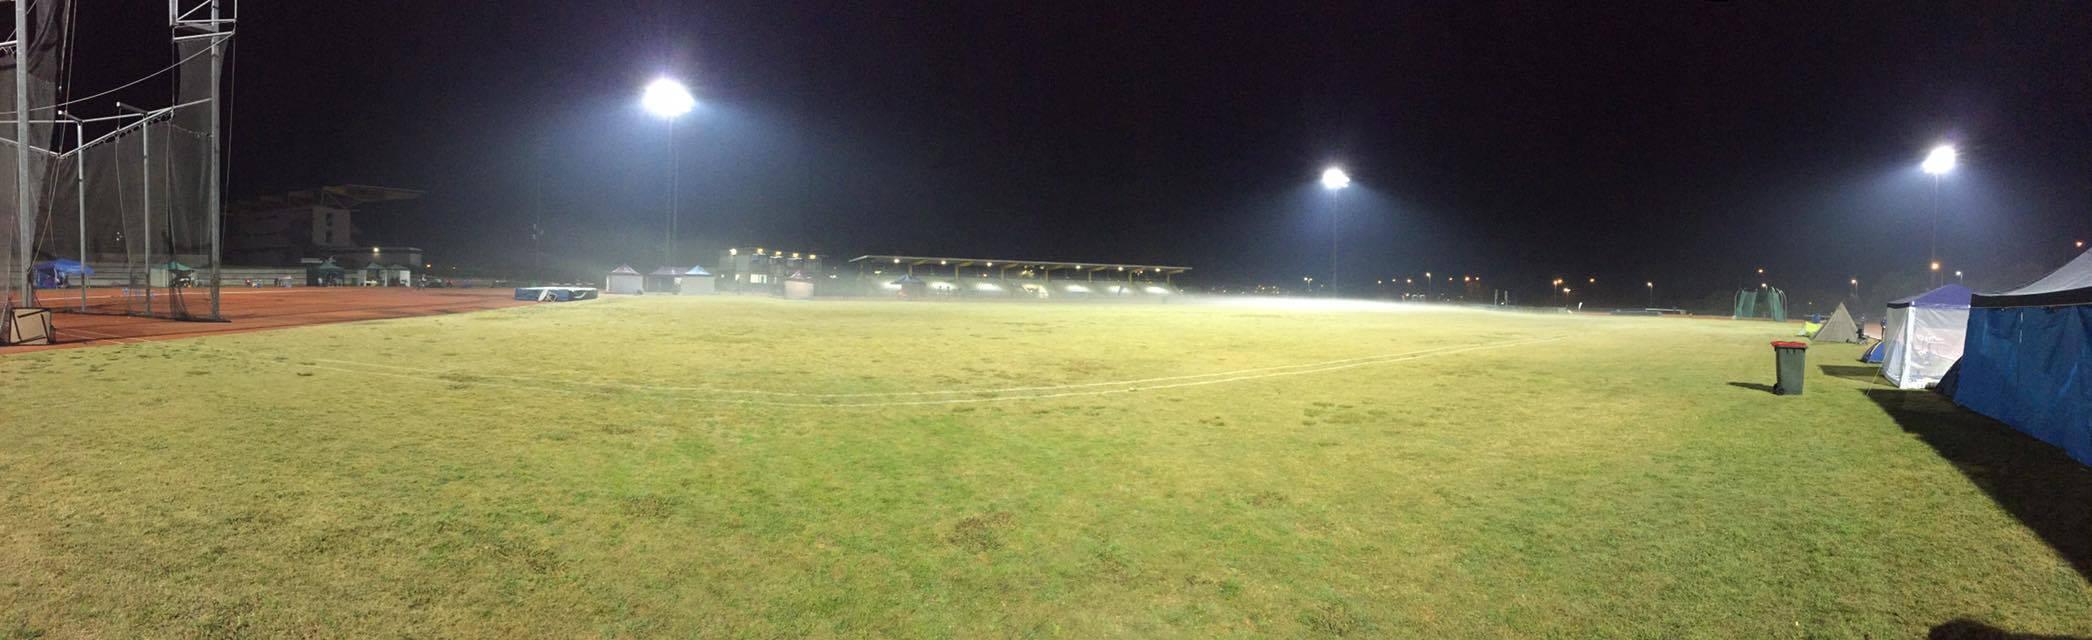 Campbelltown sprots stadium